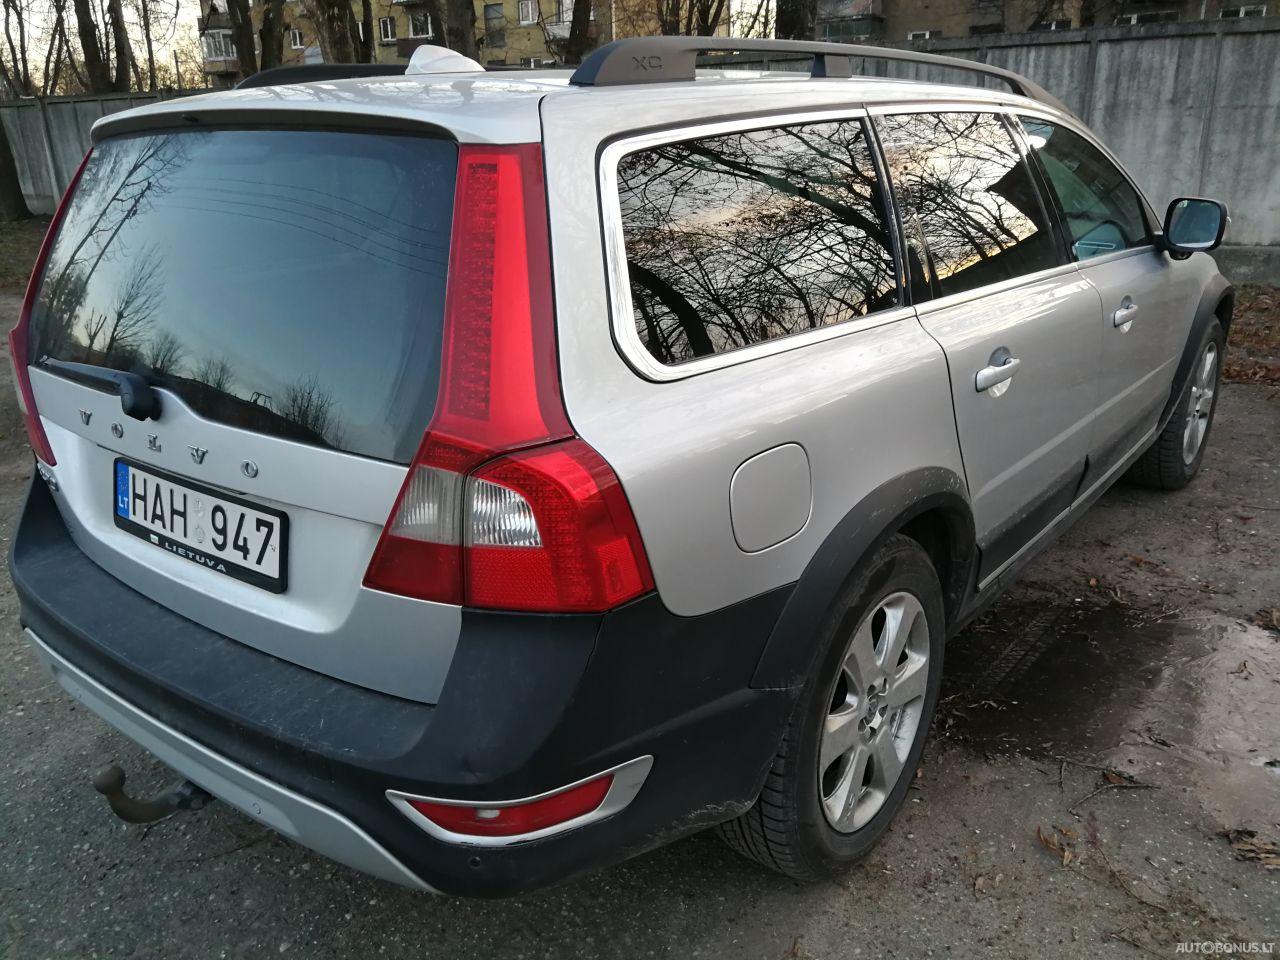 Volvo XC5, 5.5 l., universal, 5007-15-5 m.